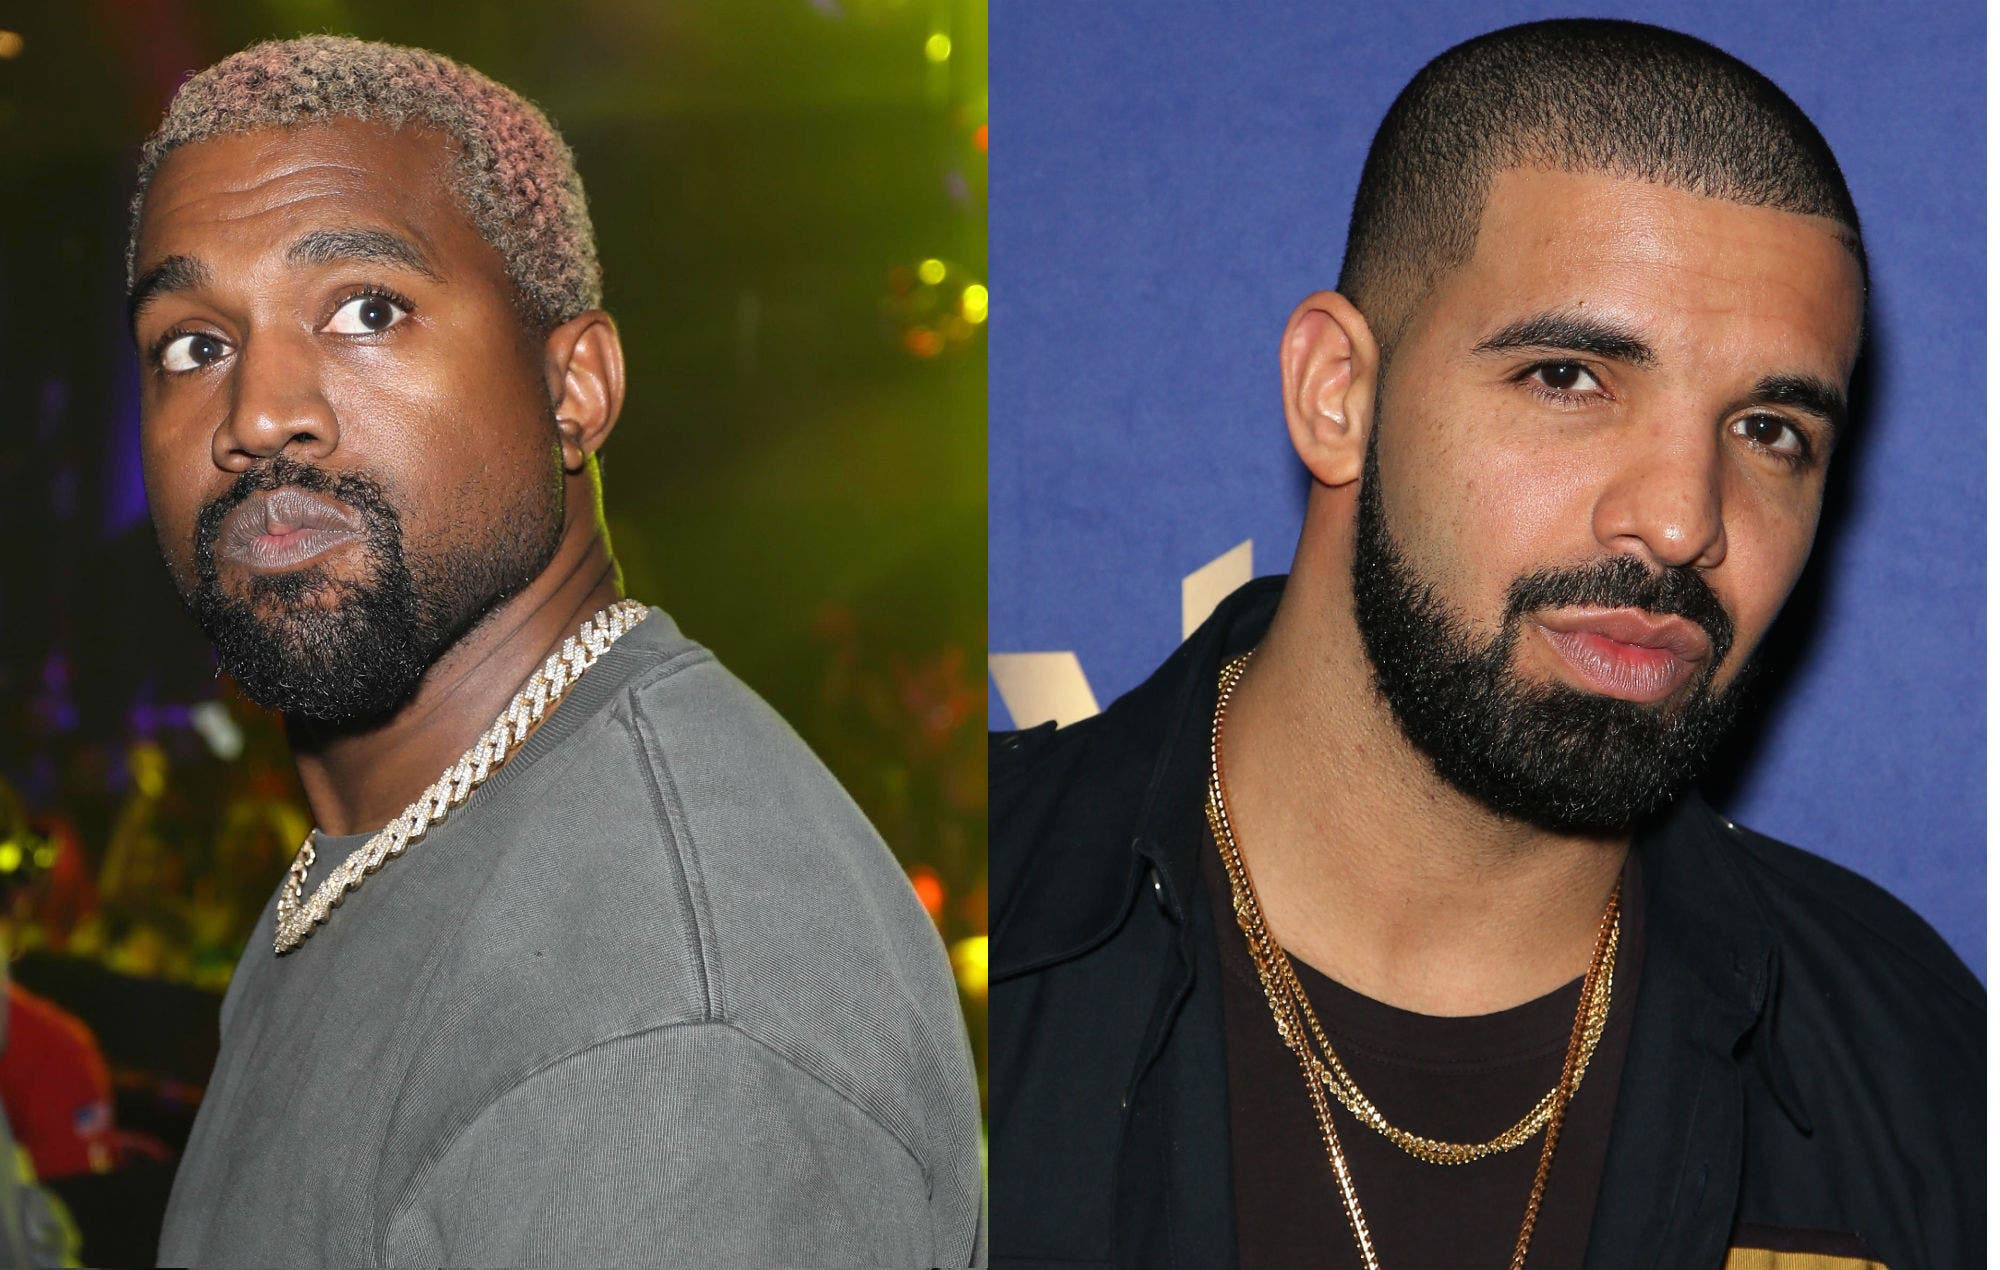 Pleito entre Kanye West y Drake desata memes en redes sociales